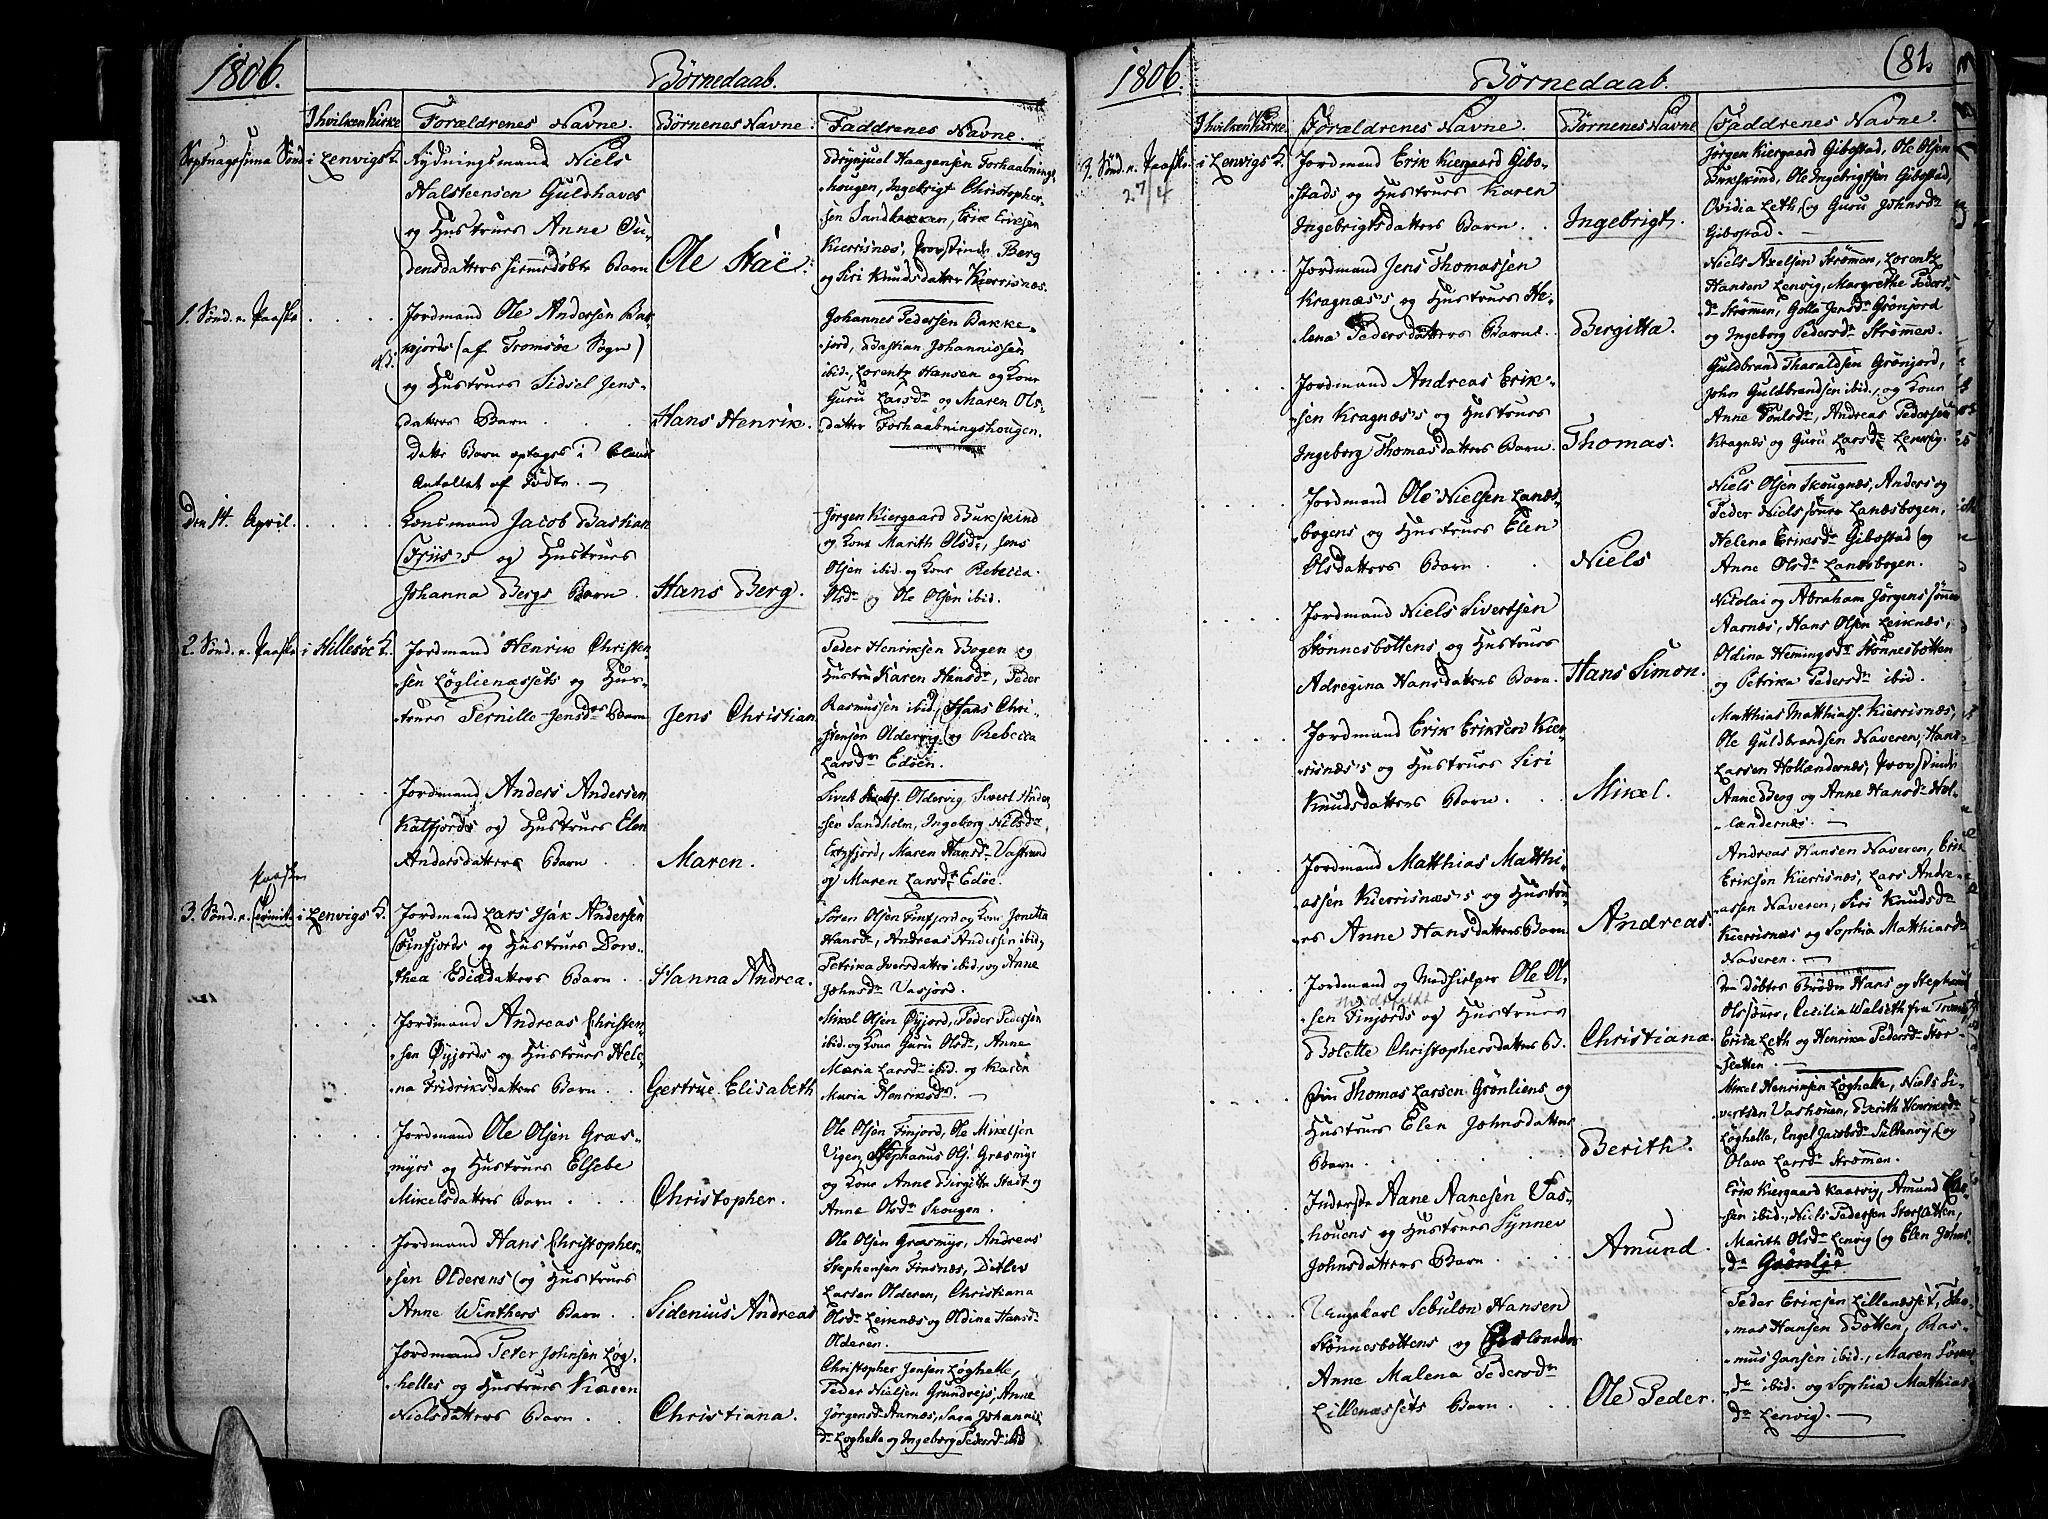 SATØ, Lenvik sokneprestembete, H/Ha/Haa/L0002kirke: Ministerialbok nr. 2, 1784-1820, s. 81